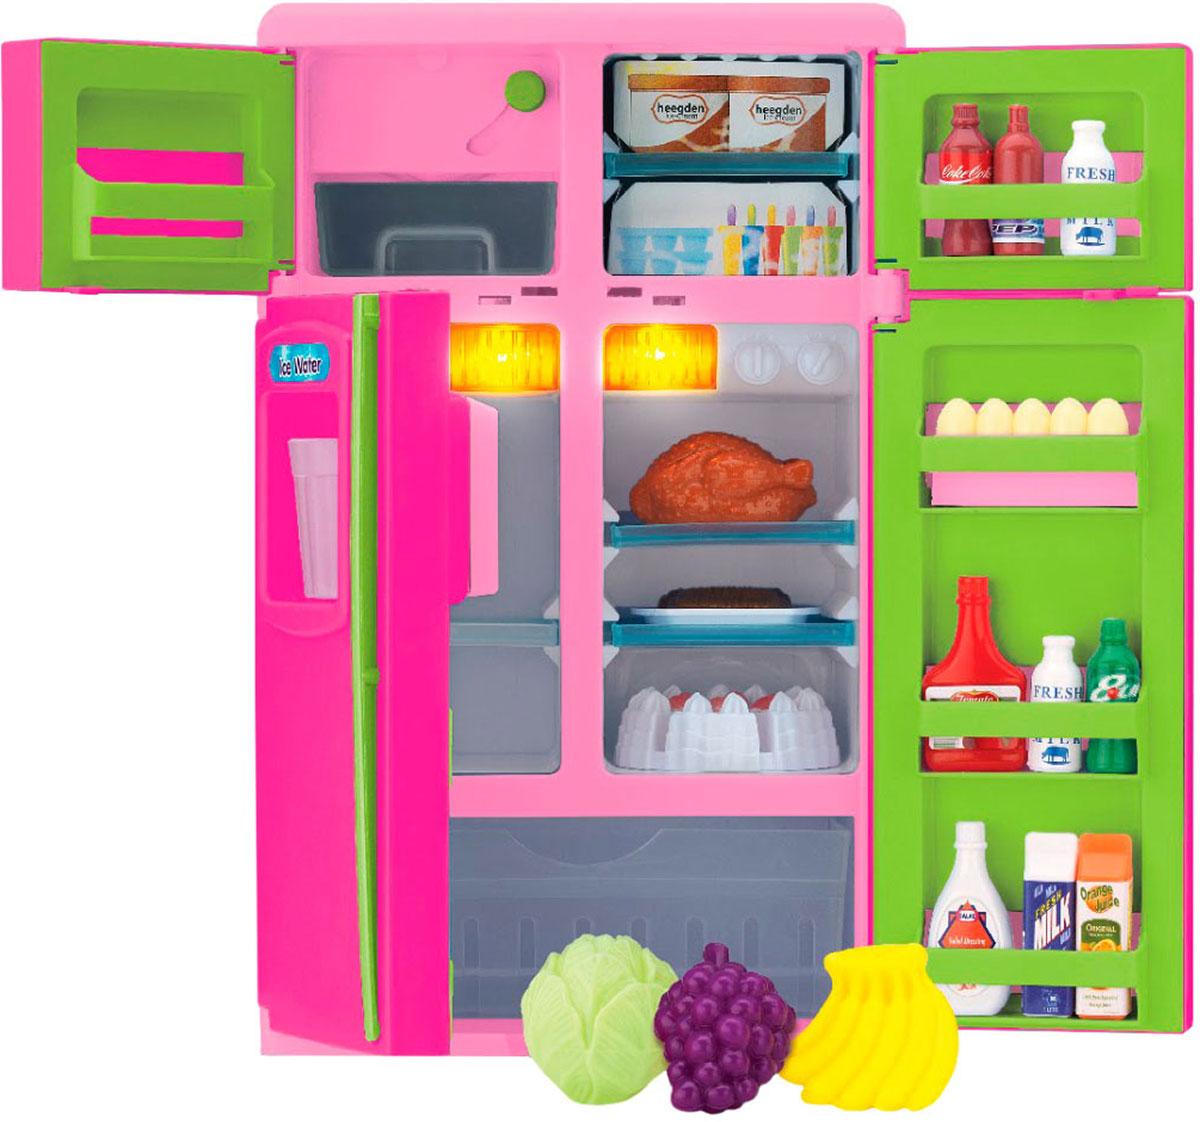 Keenway Игрушечный холодильник игровая техника keenway аналог 21657 холодильник